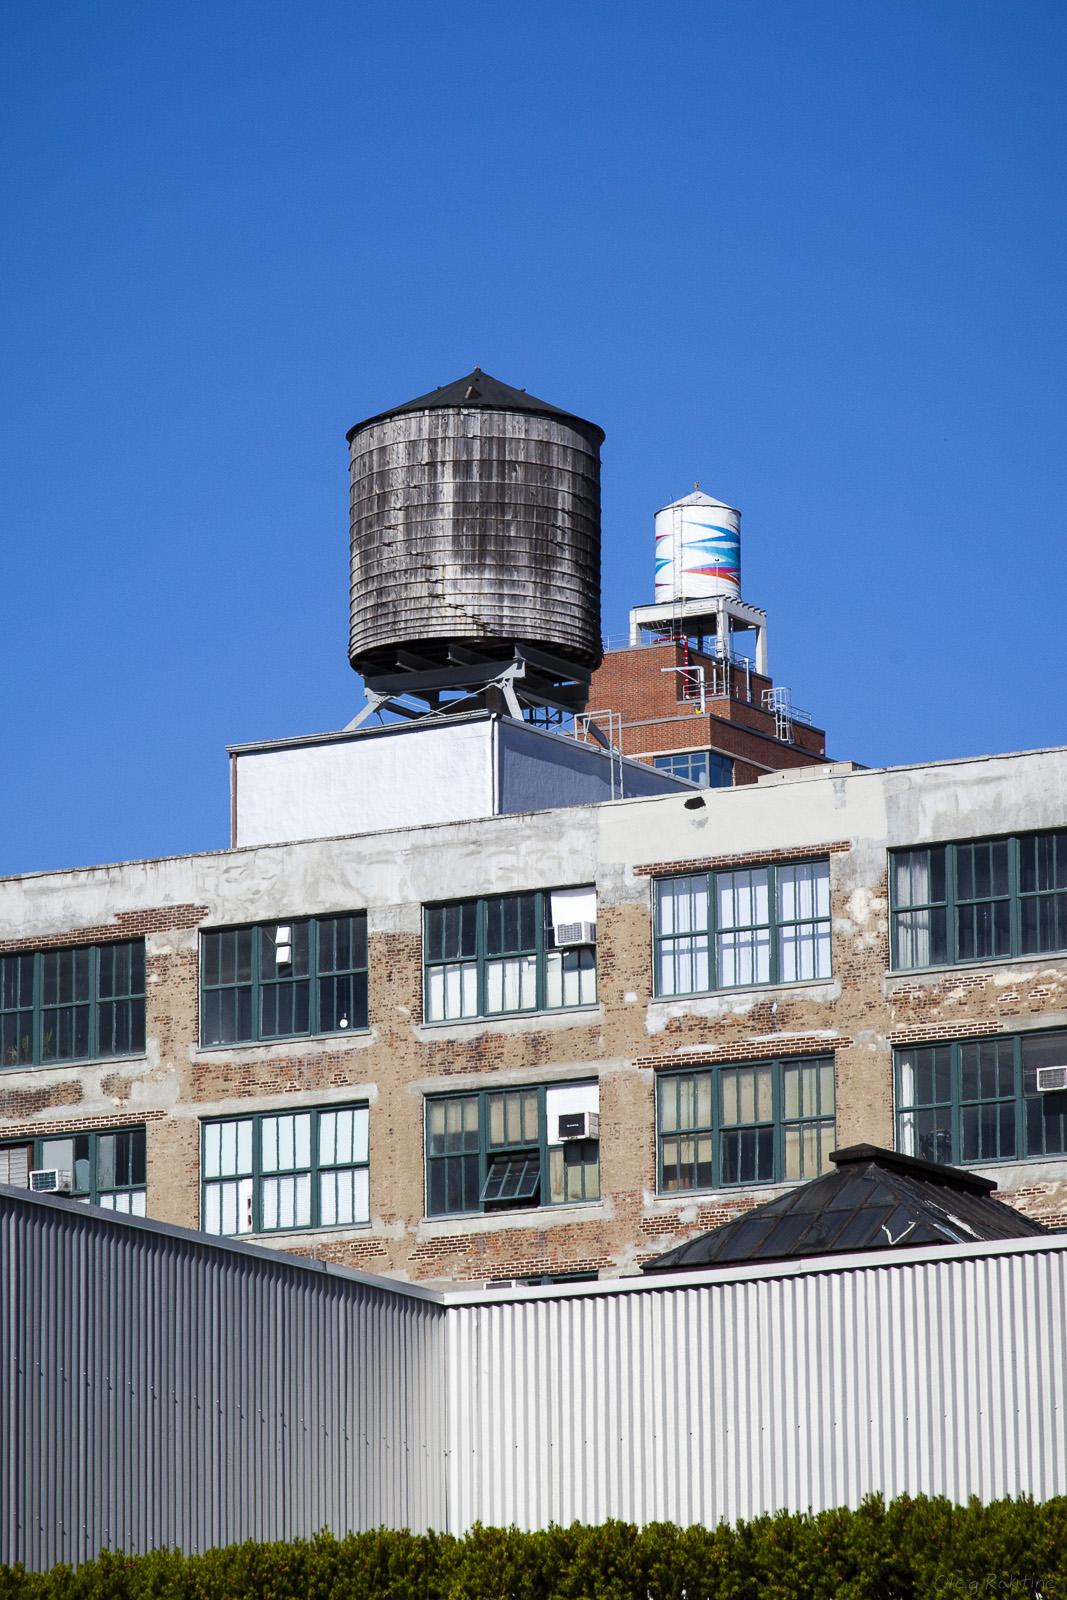 NYC2014-037.jpg